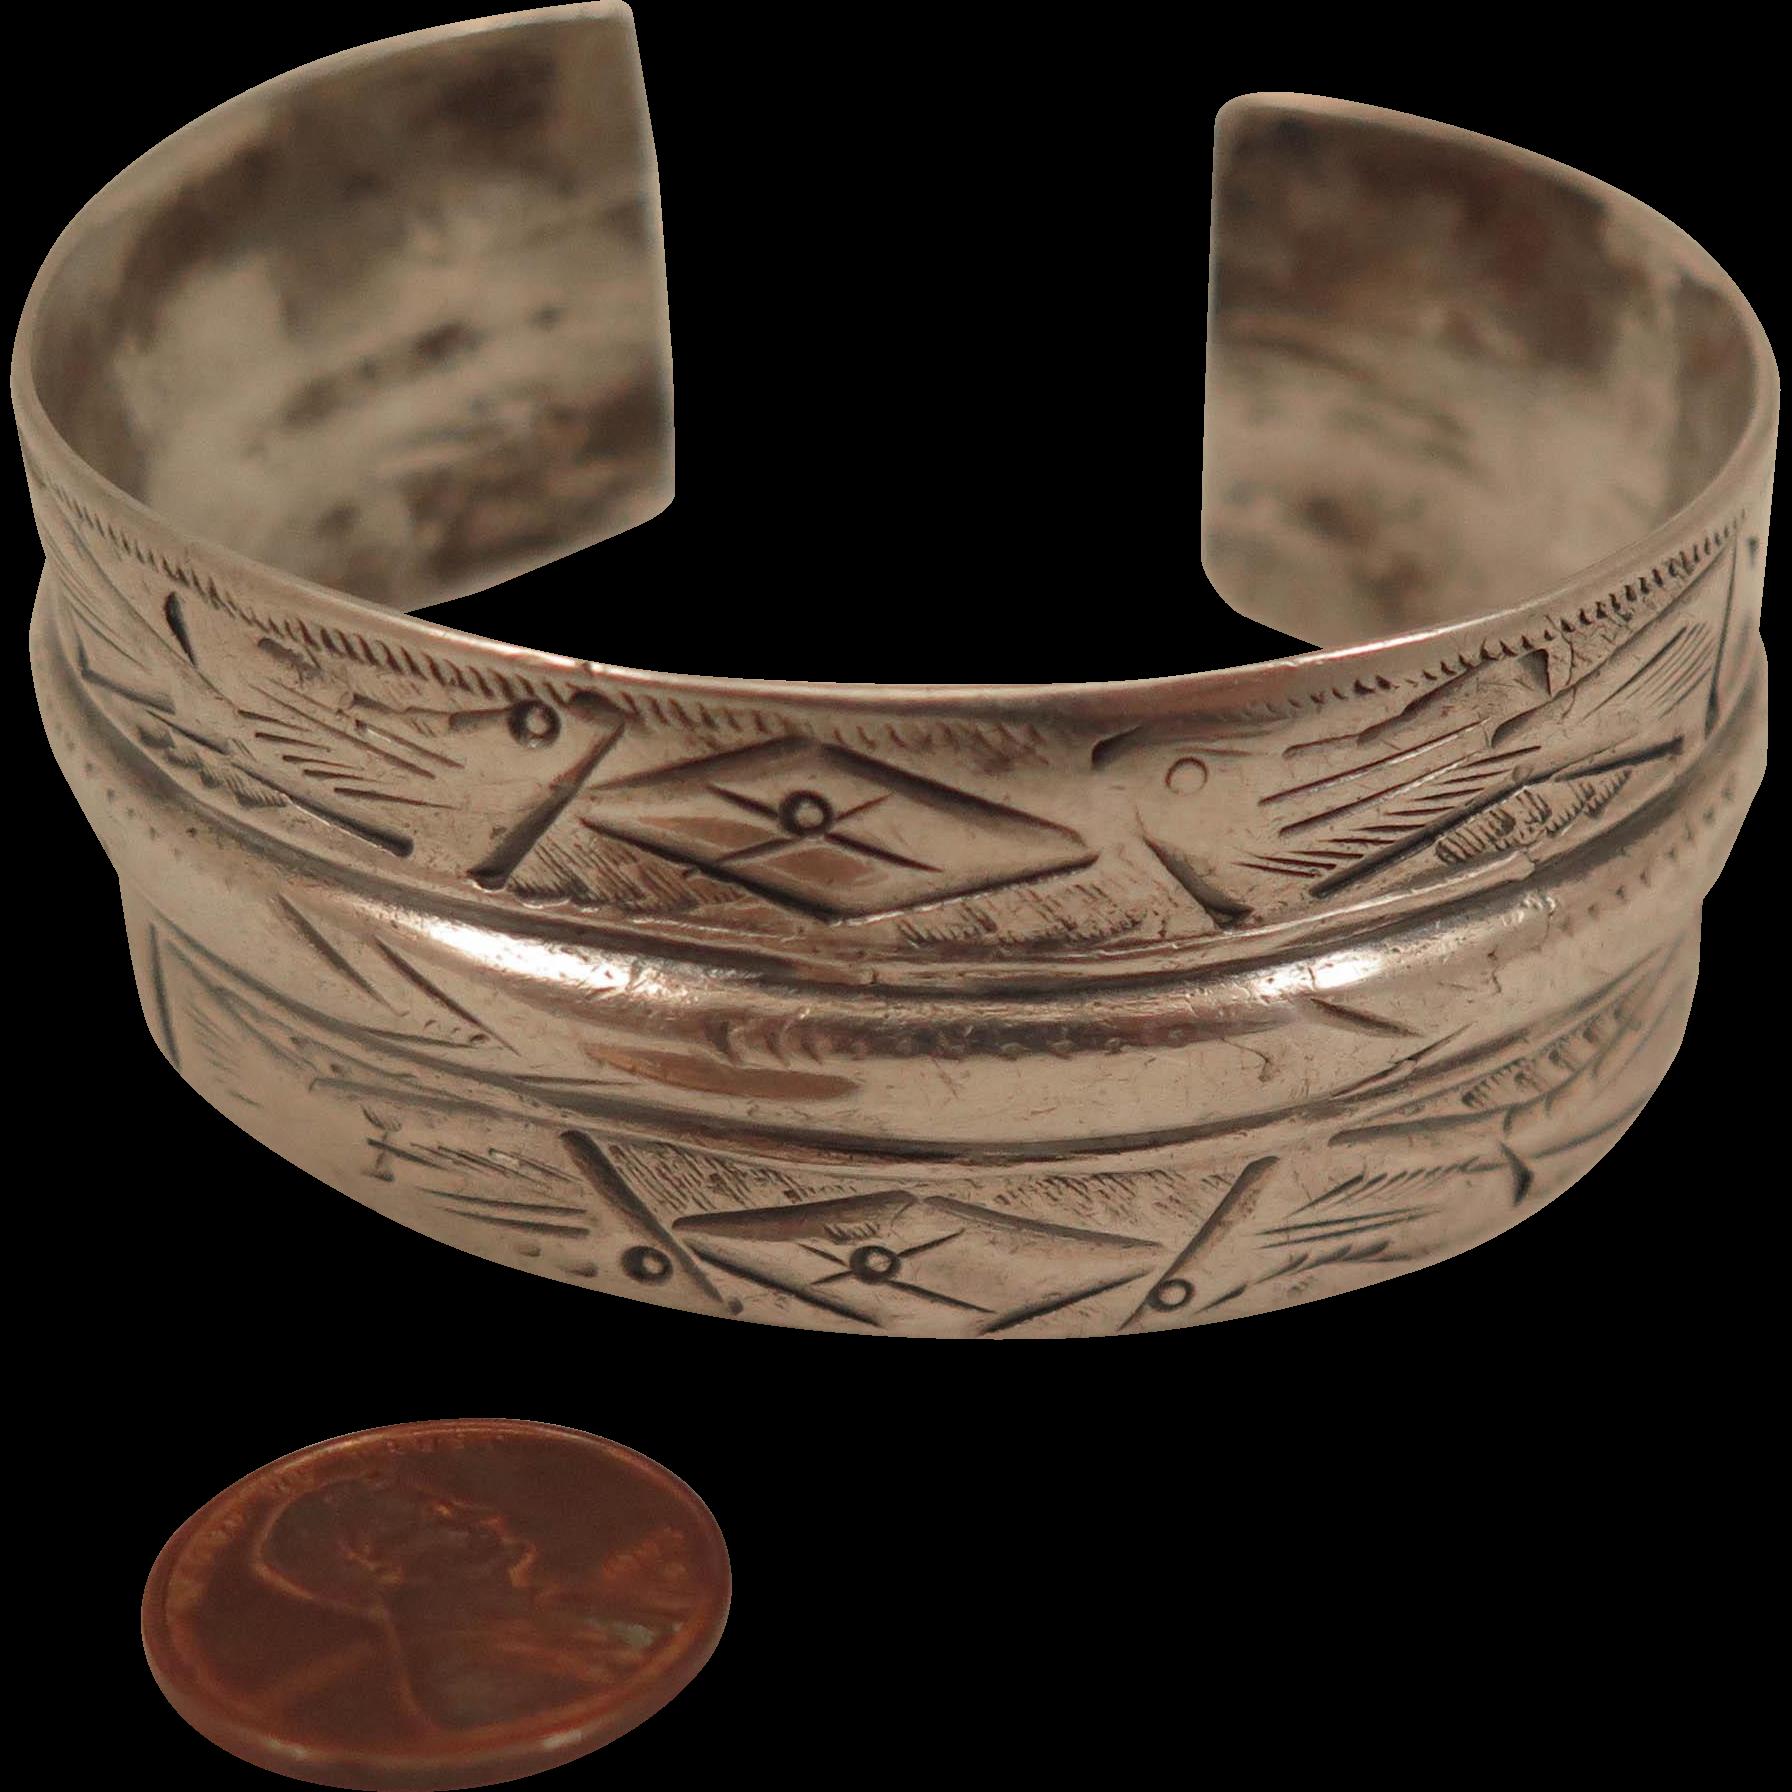 Antique Sterling Silver Ottoman Empire Bracelet Cuff